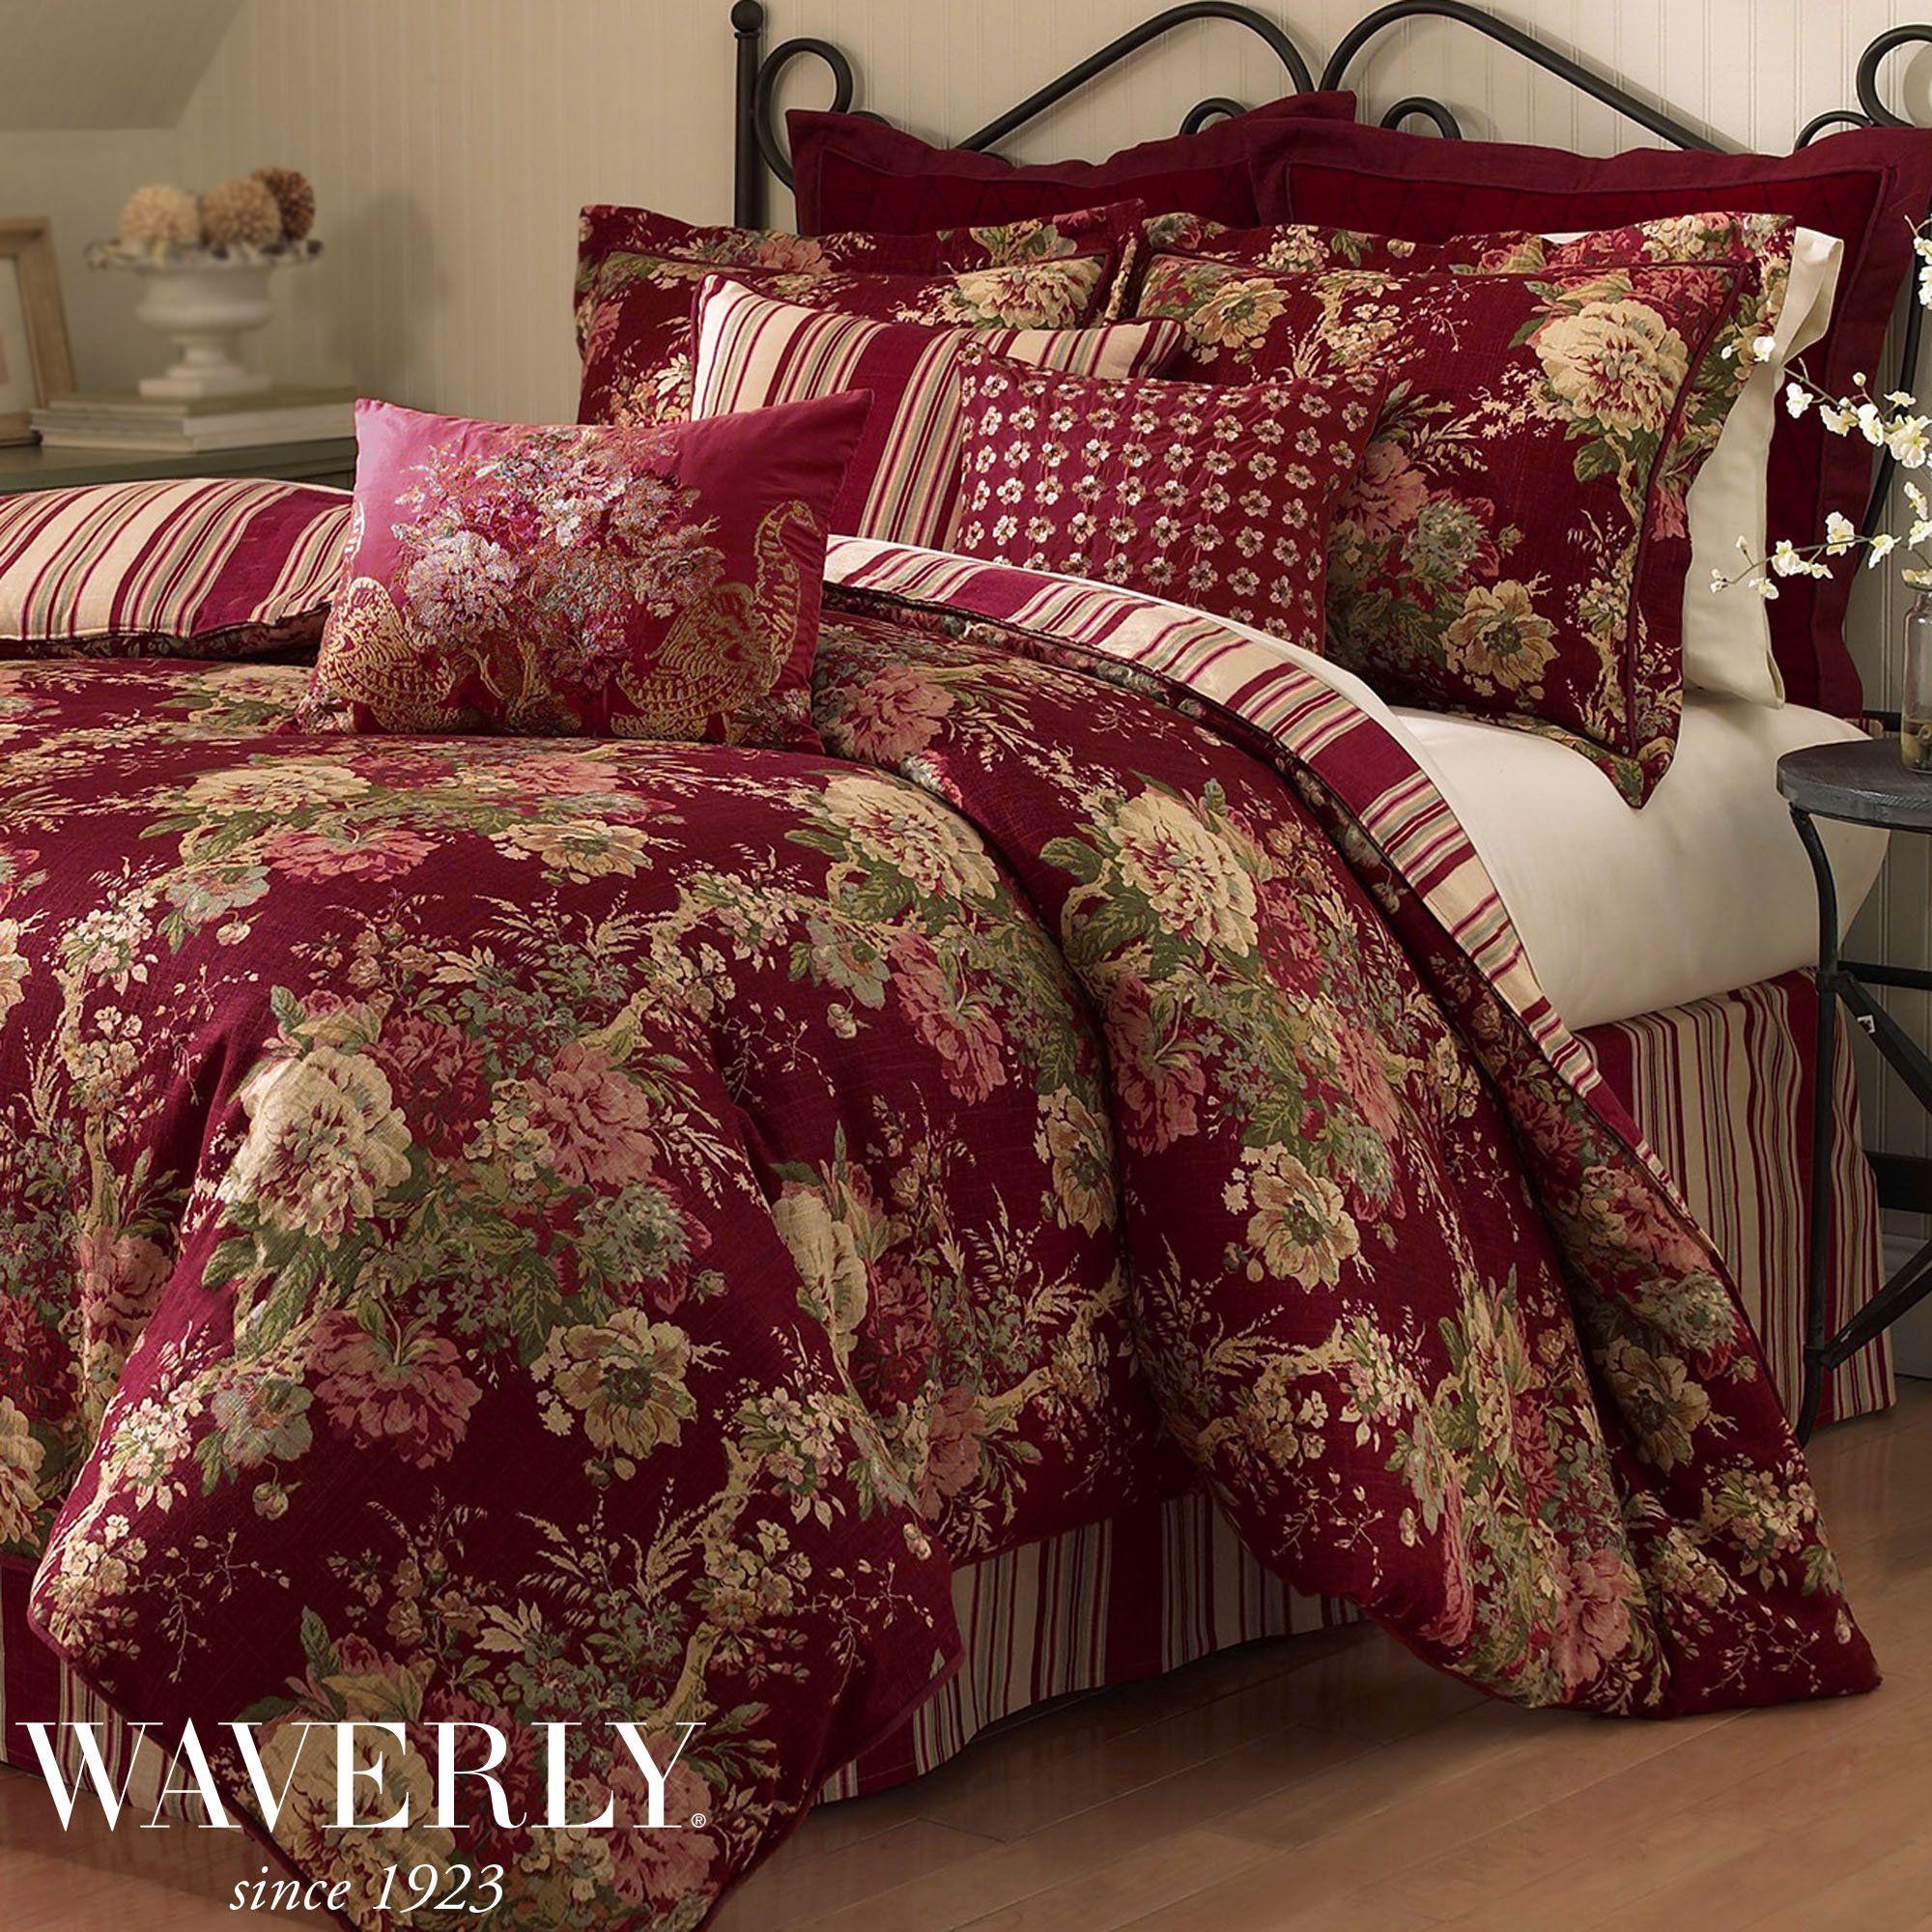 Waverly Ballad Bouquet Valance Floral Red Cream Blue New